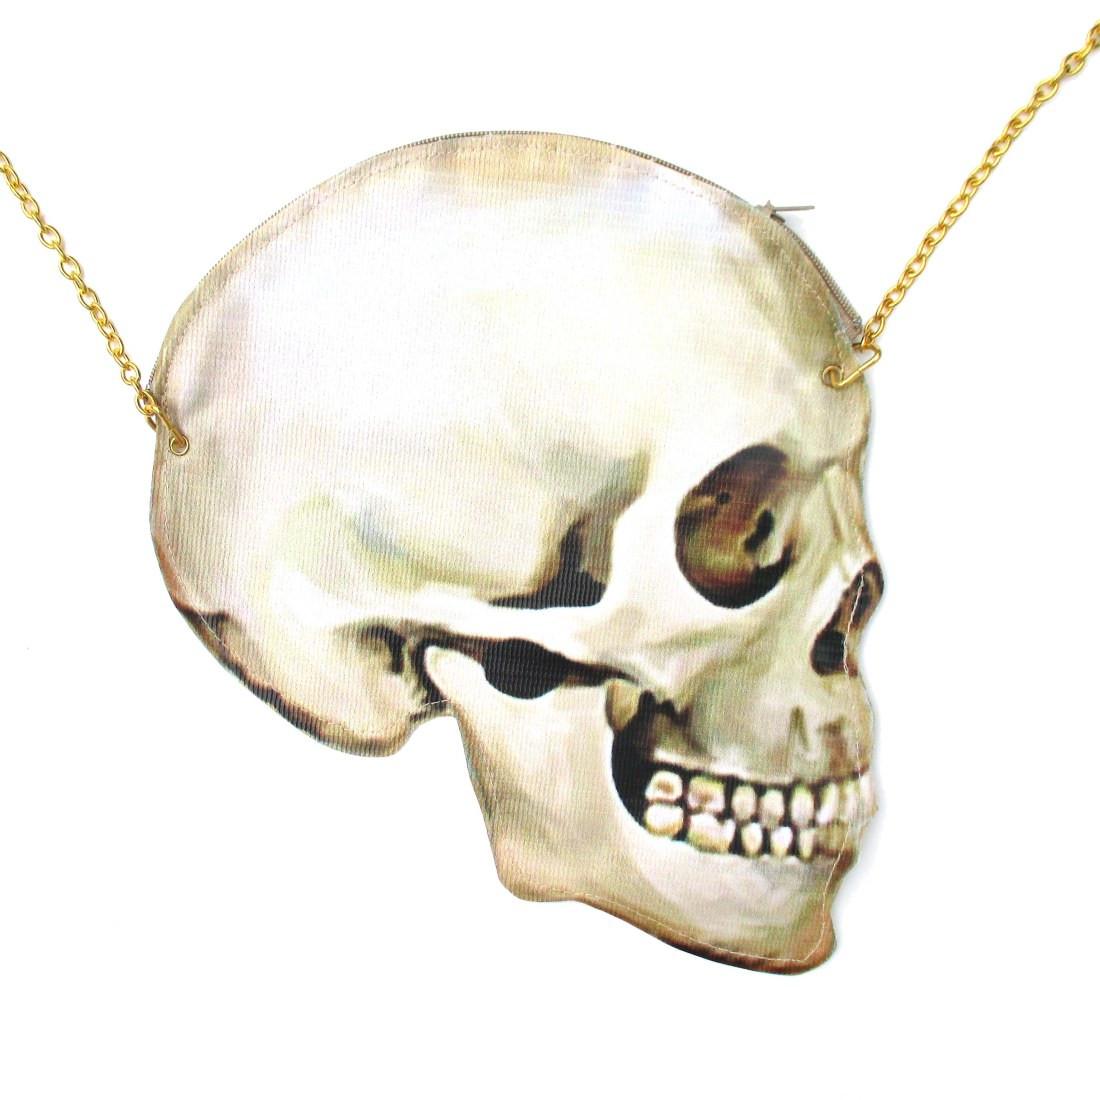 Quirky skeleton skull bones head shaped vinyl cross body shoulder bag  handmade original 915491b88ba7b